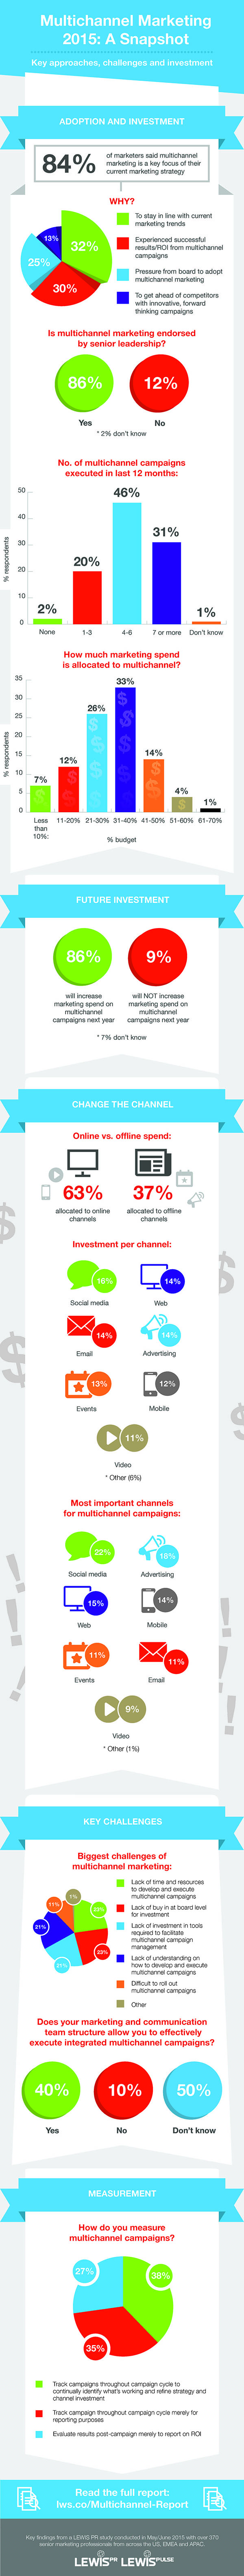 Infografik: Multichannel-Marketing 2015, Quelle: lewispr